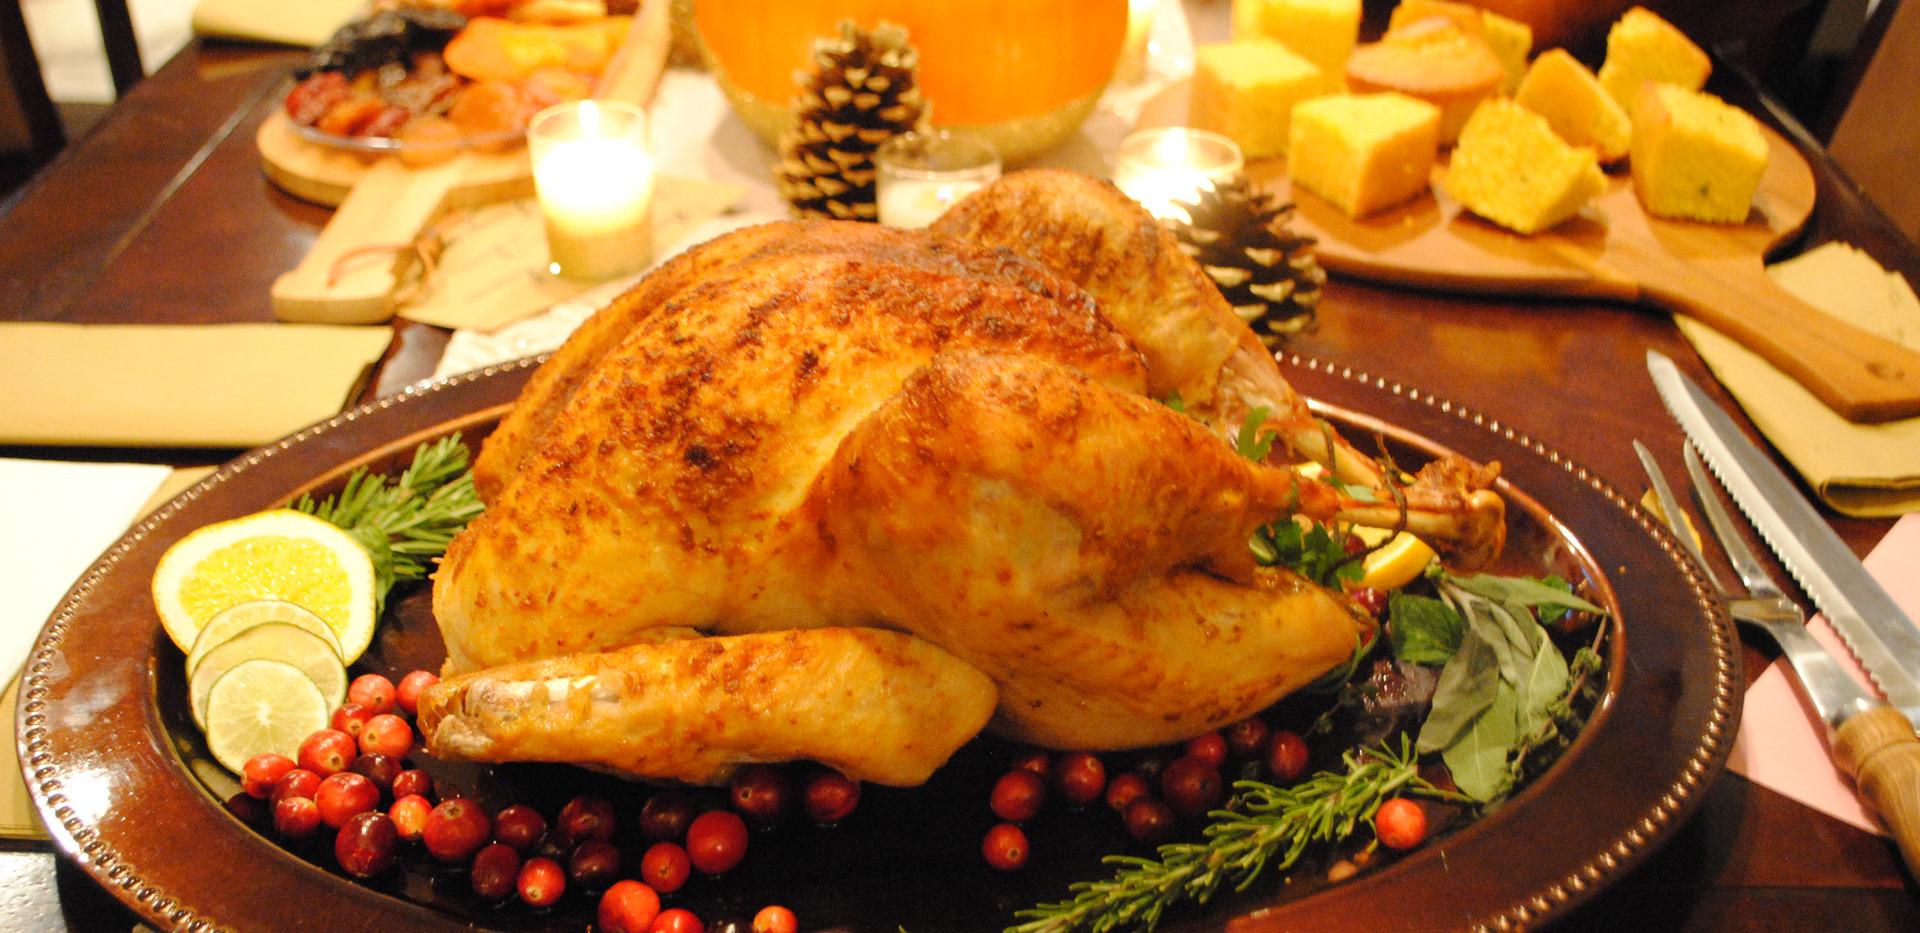 Masala Spiced Turkey | Marinated 16 lbs turkey-serves ~15